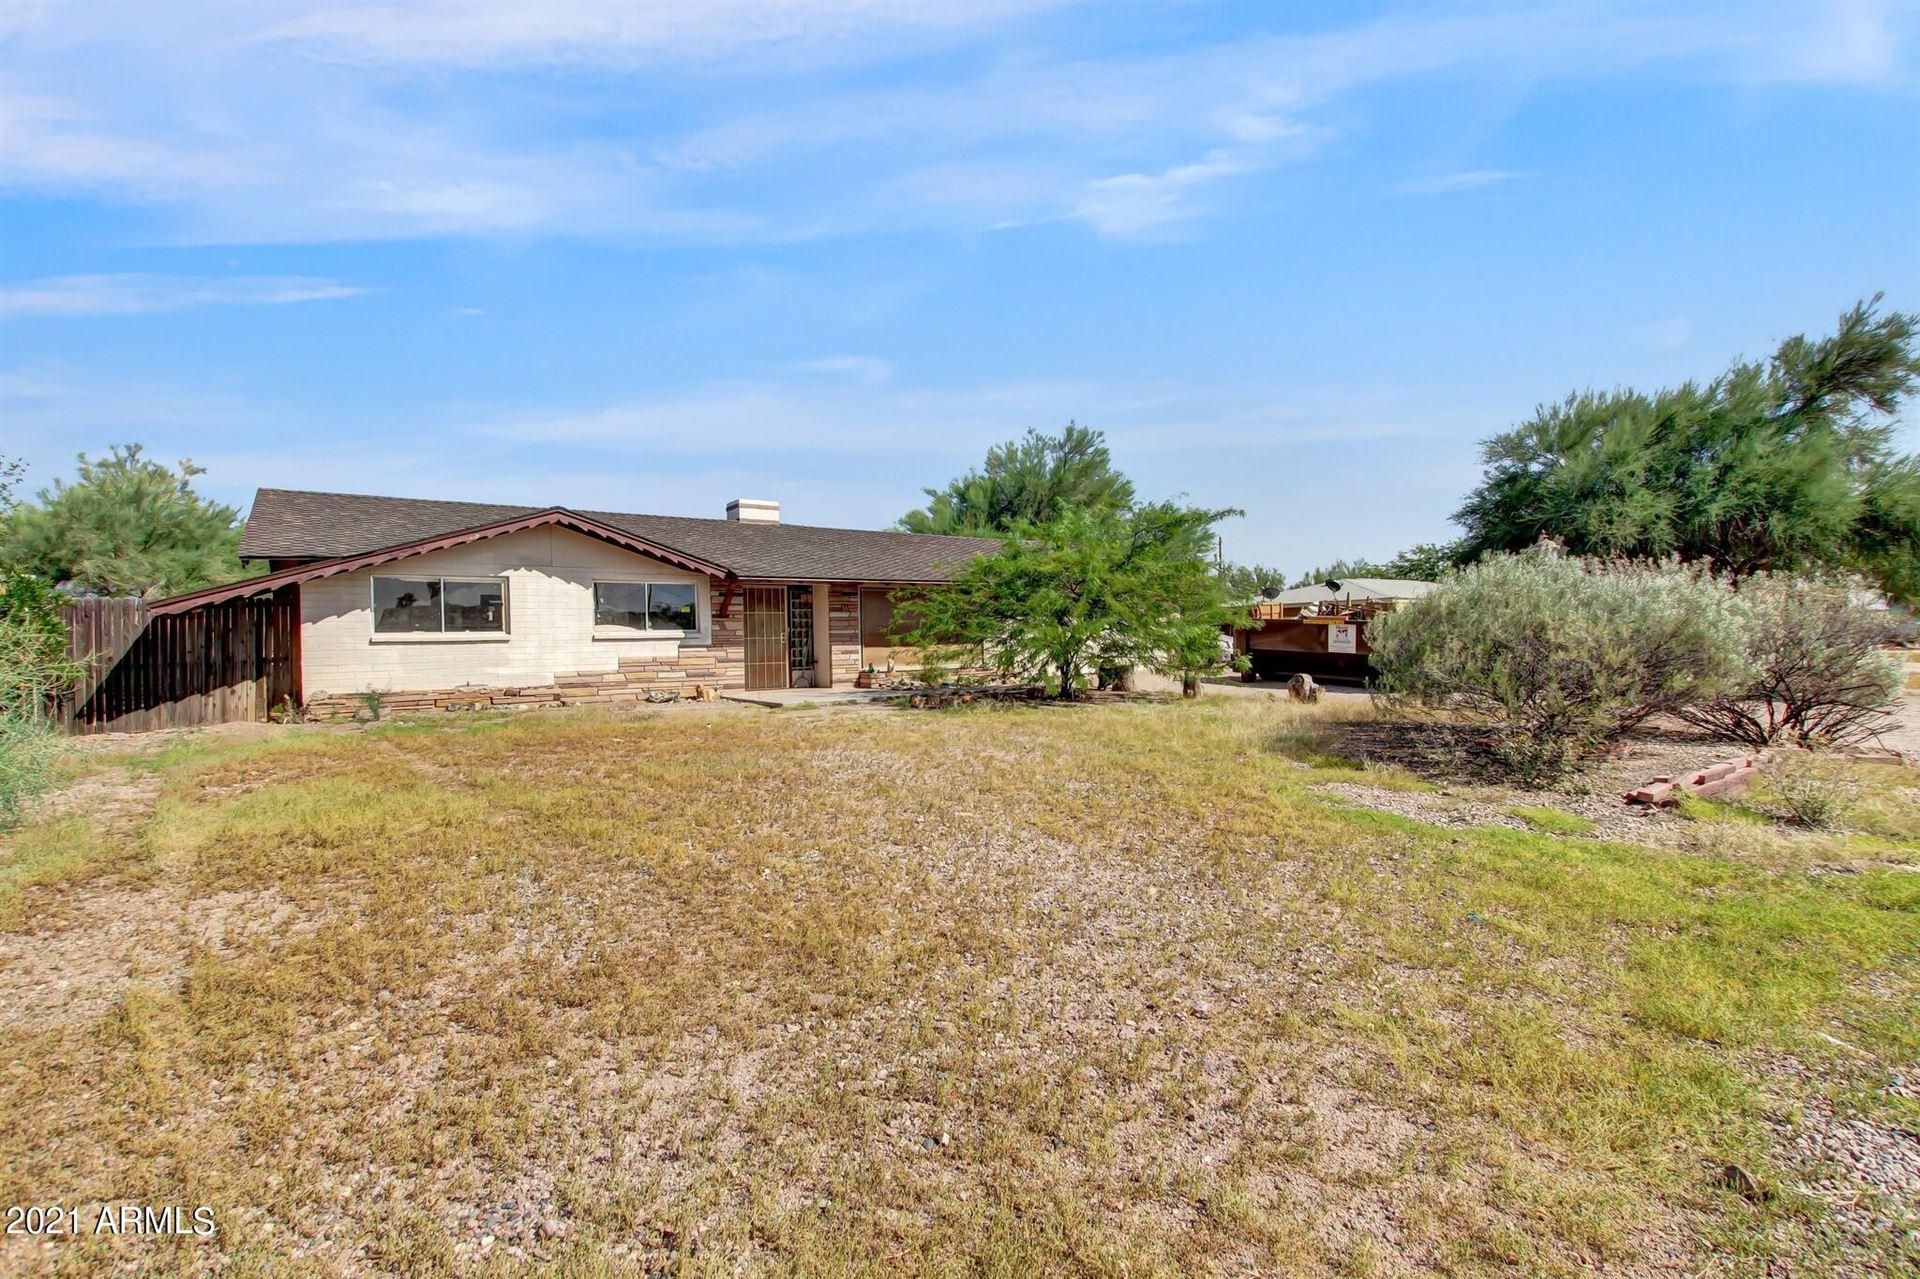 Photo of 289 N THUNDERBIRD Drive, Apache Junction, AZ 85120 (MLS # 6295357)